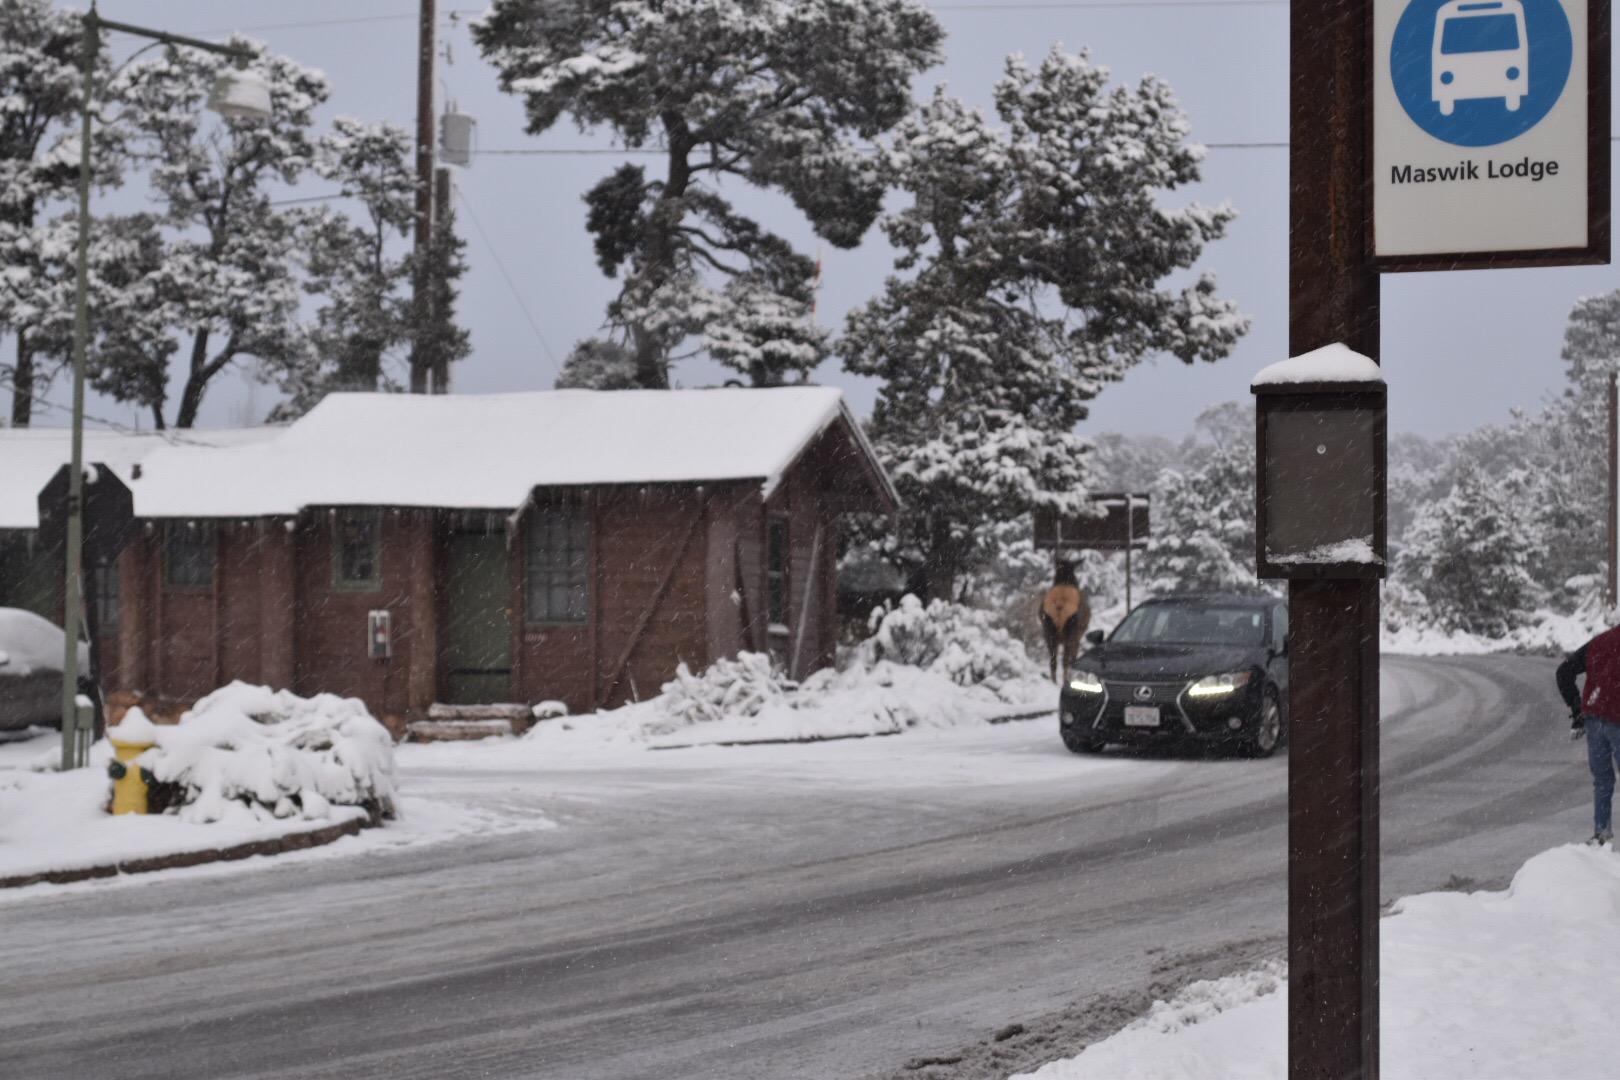 MilMomAdventures - Grand Canyon Maswik Lodge